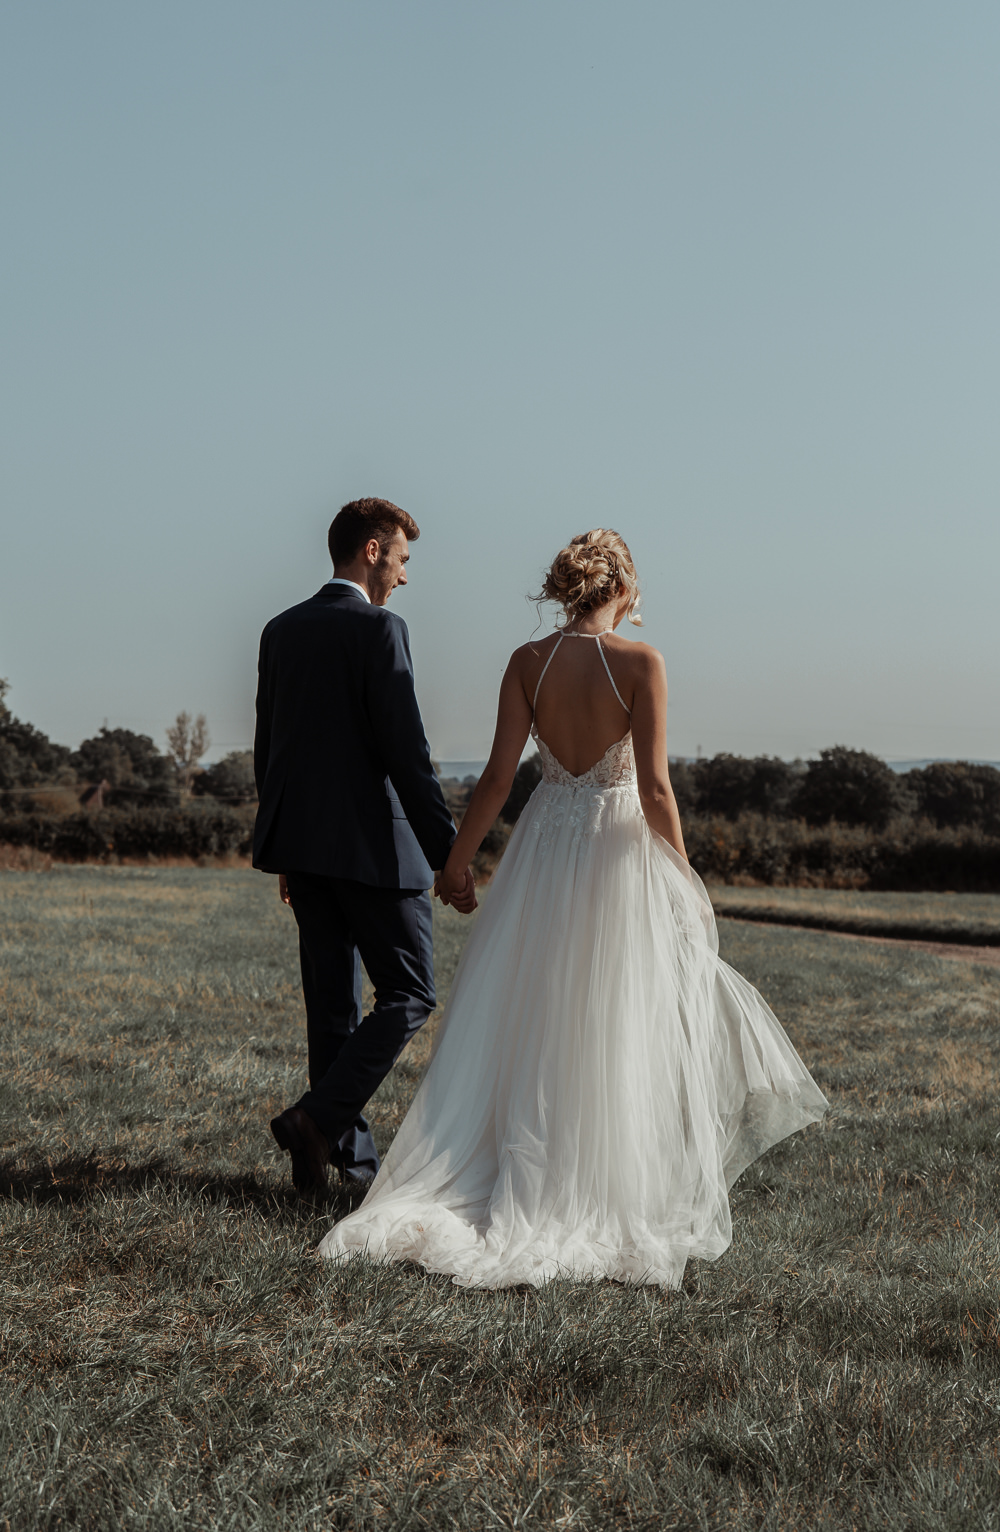 Dress Gown Bride Bridal Tulle Veil Floaty Boho Intimate Wedding Ideas Imogen Eve Photography